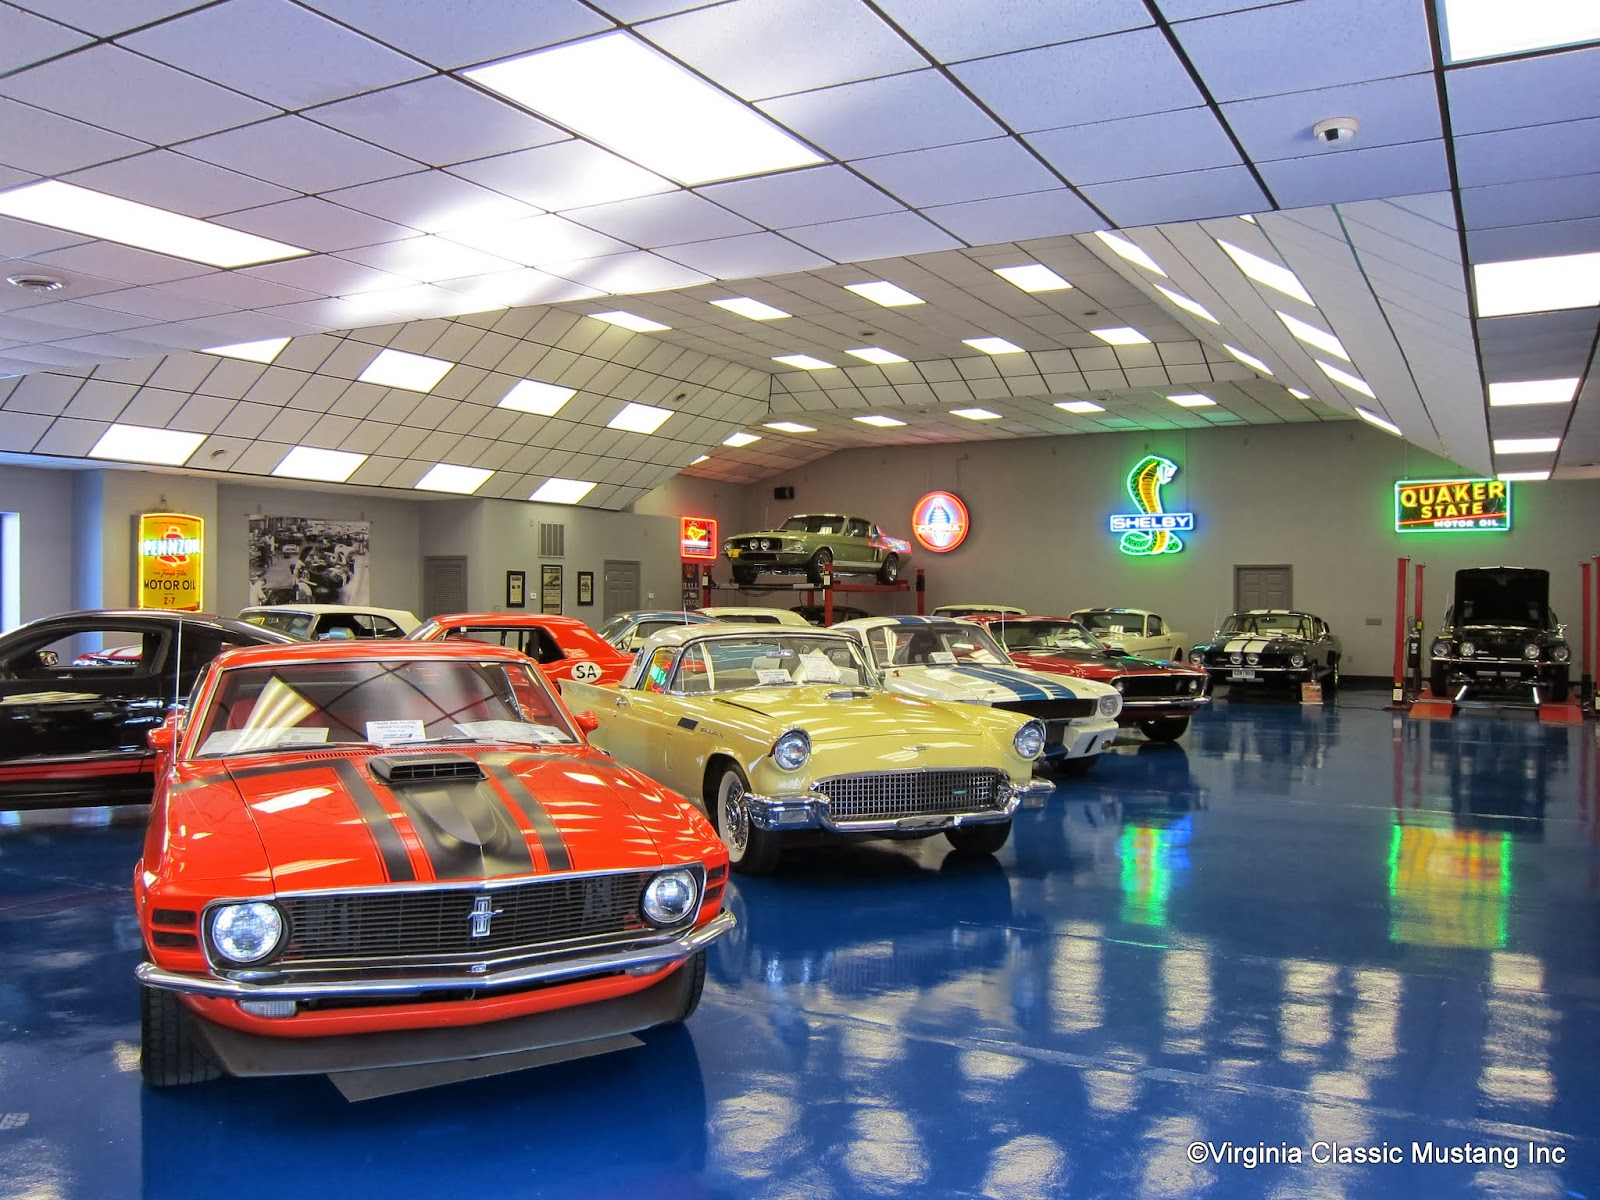 Virginia Classic Mustang Blog Performance Motors Of Hanover - Car show hanover pa